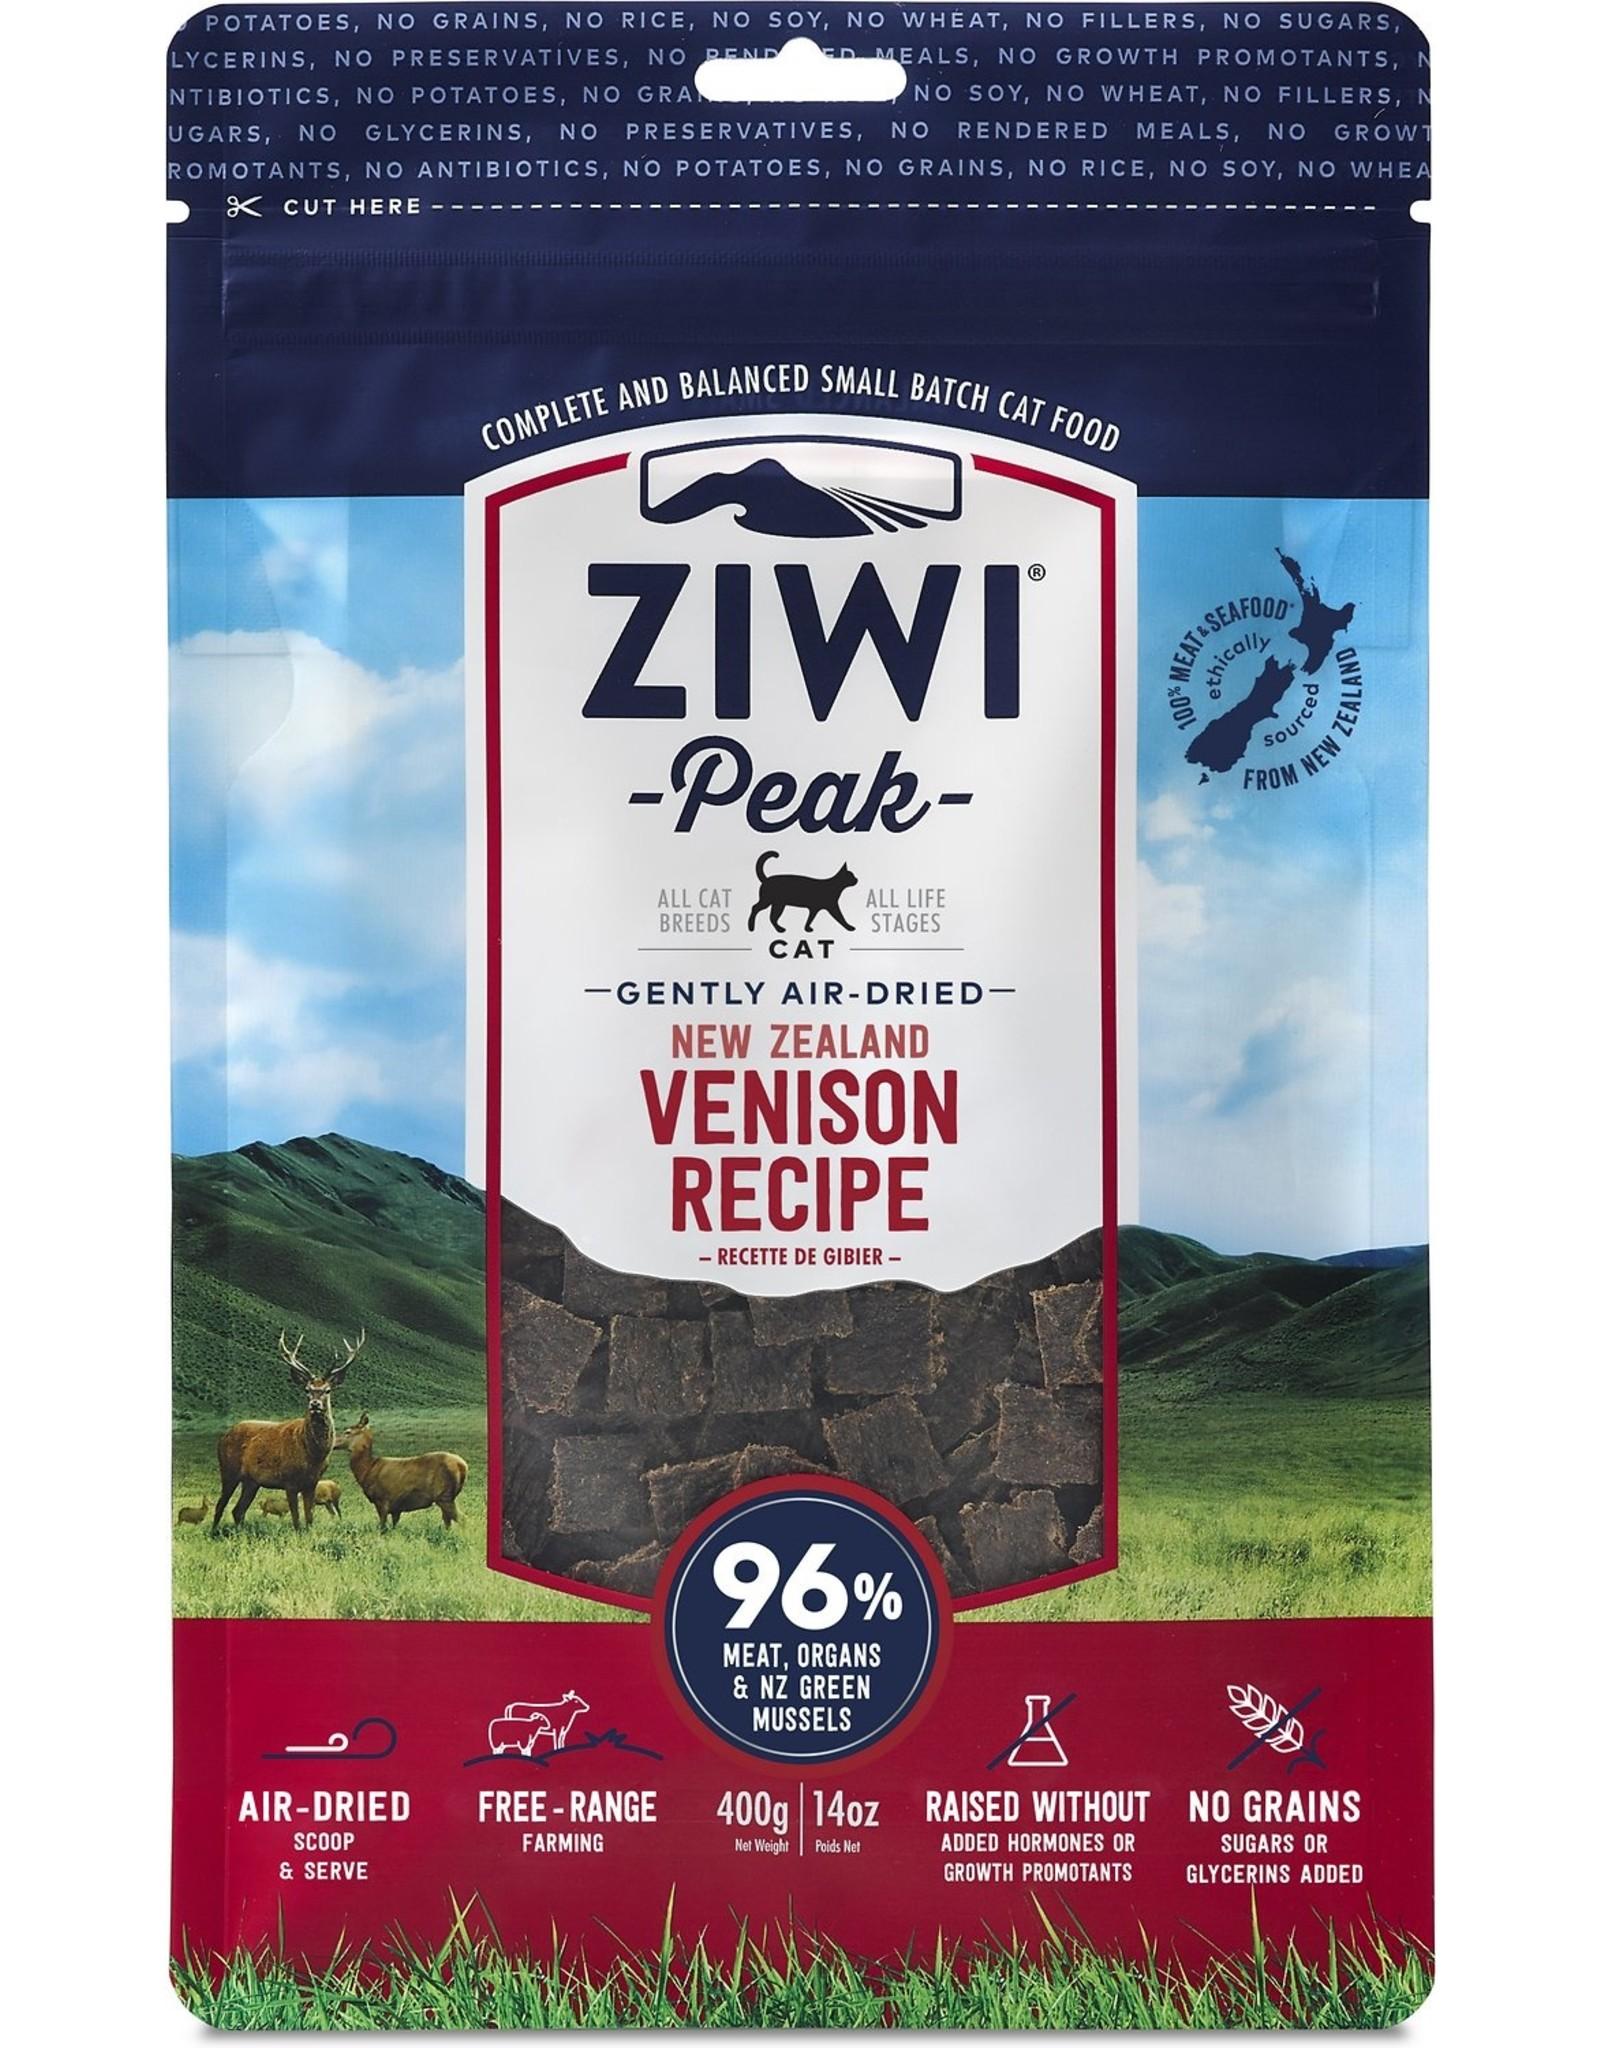 Ziwi Peak ZIWI PEAK CAT GENTLY AIR-DRIED NEW ZEALAND VENISON RECIPE